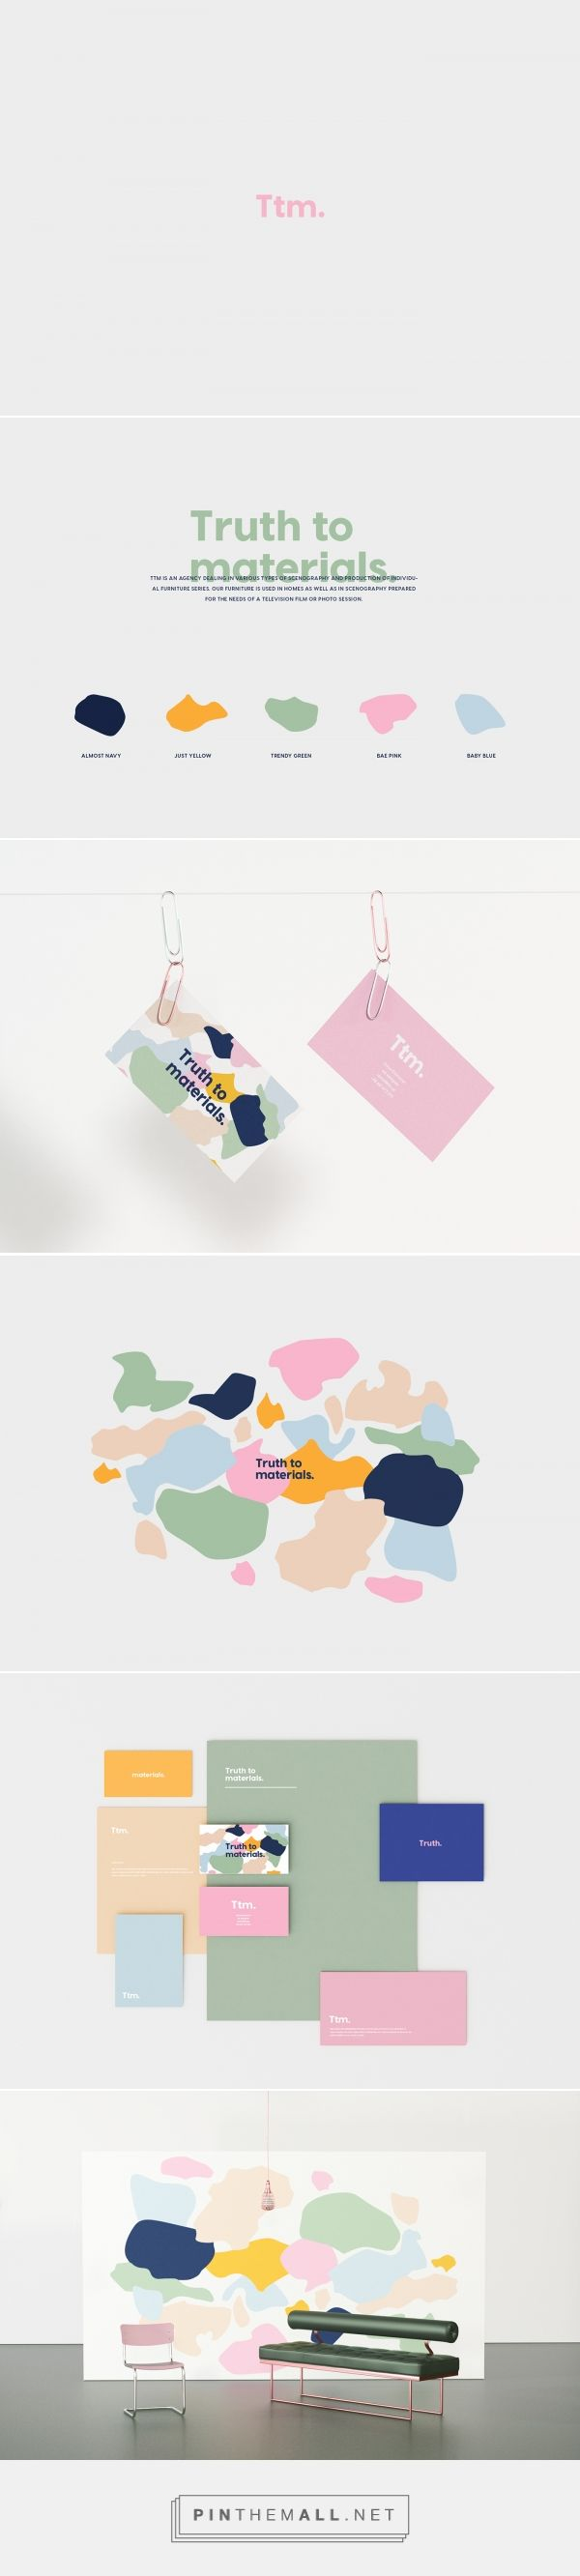 Truth to materials. on Behance. #branding visual identity, logo, colourful branding, contemporary branding